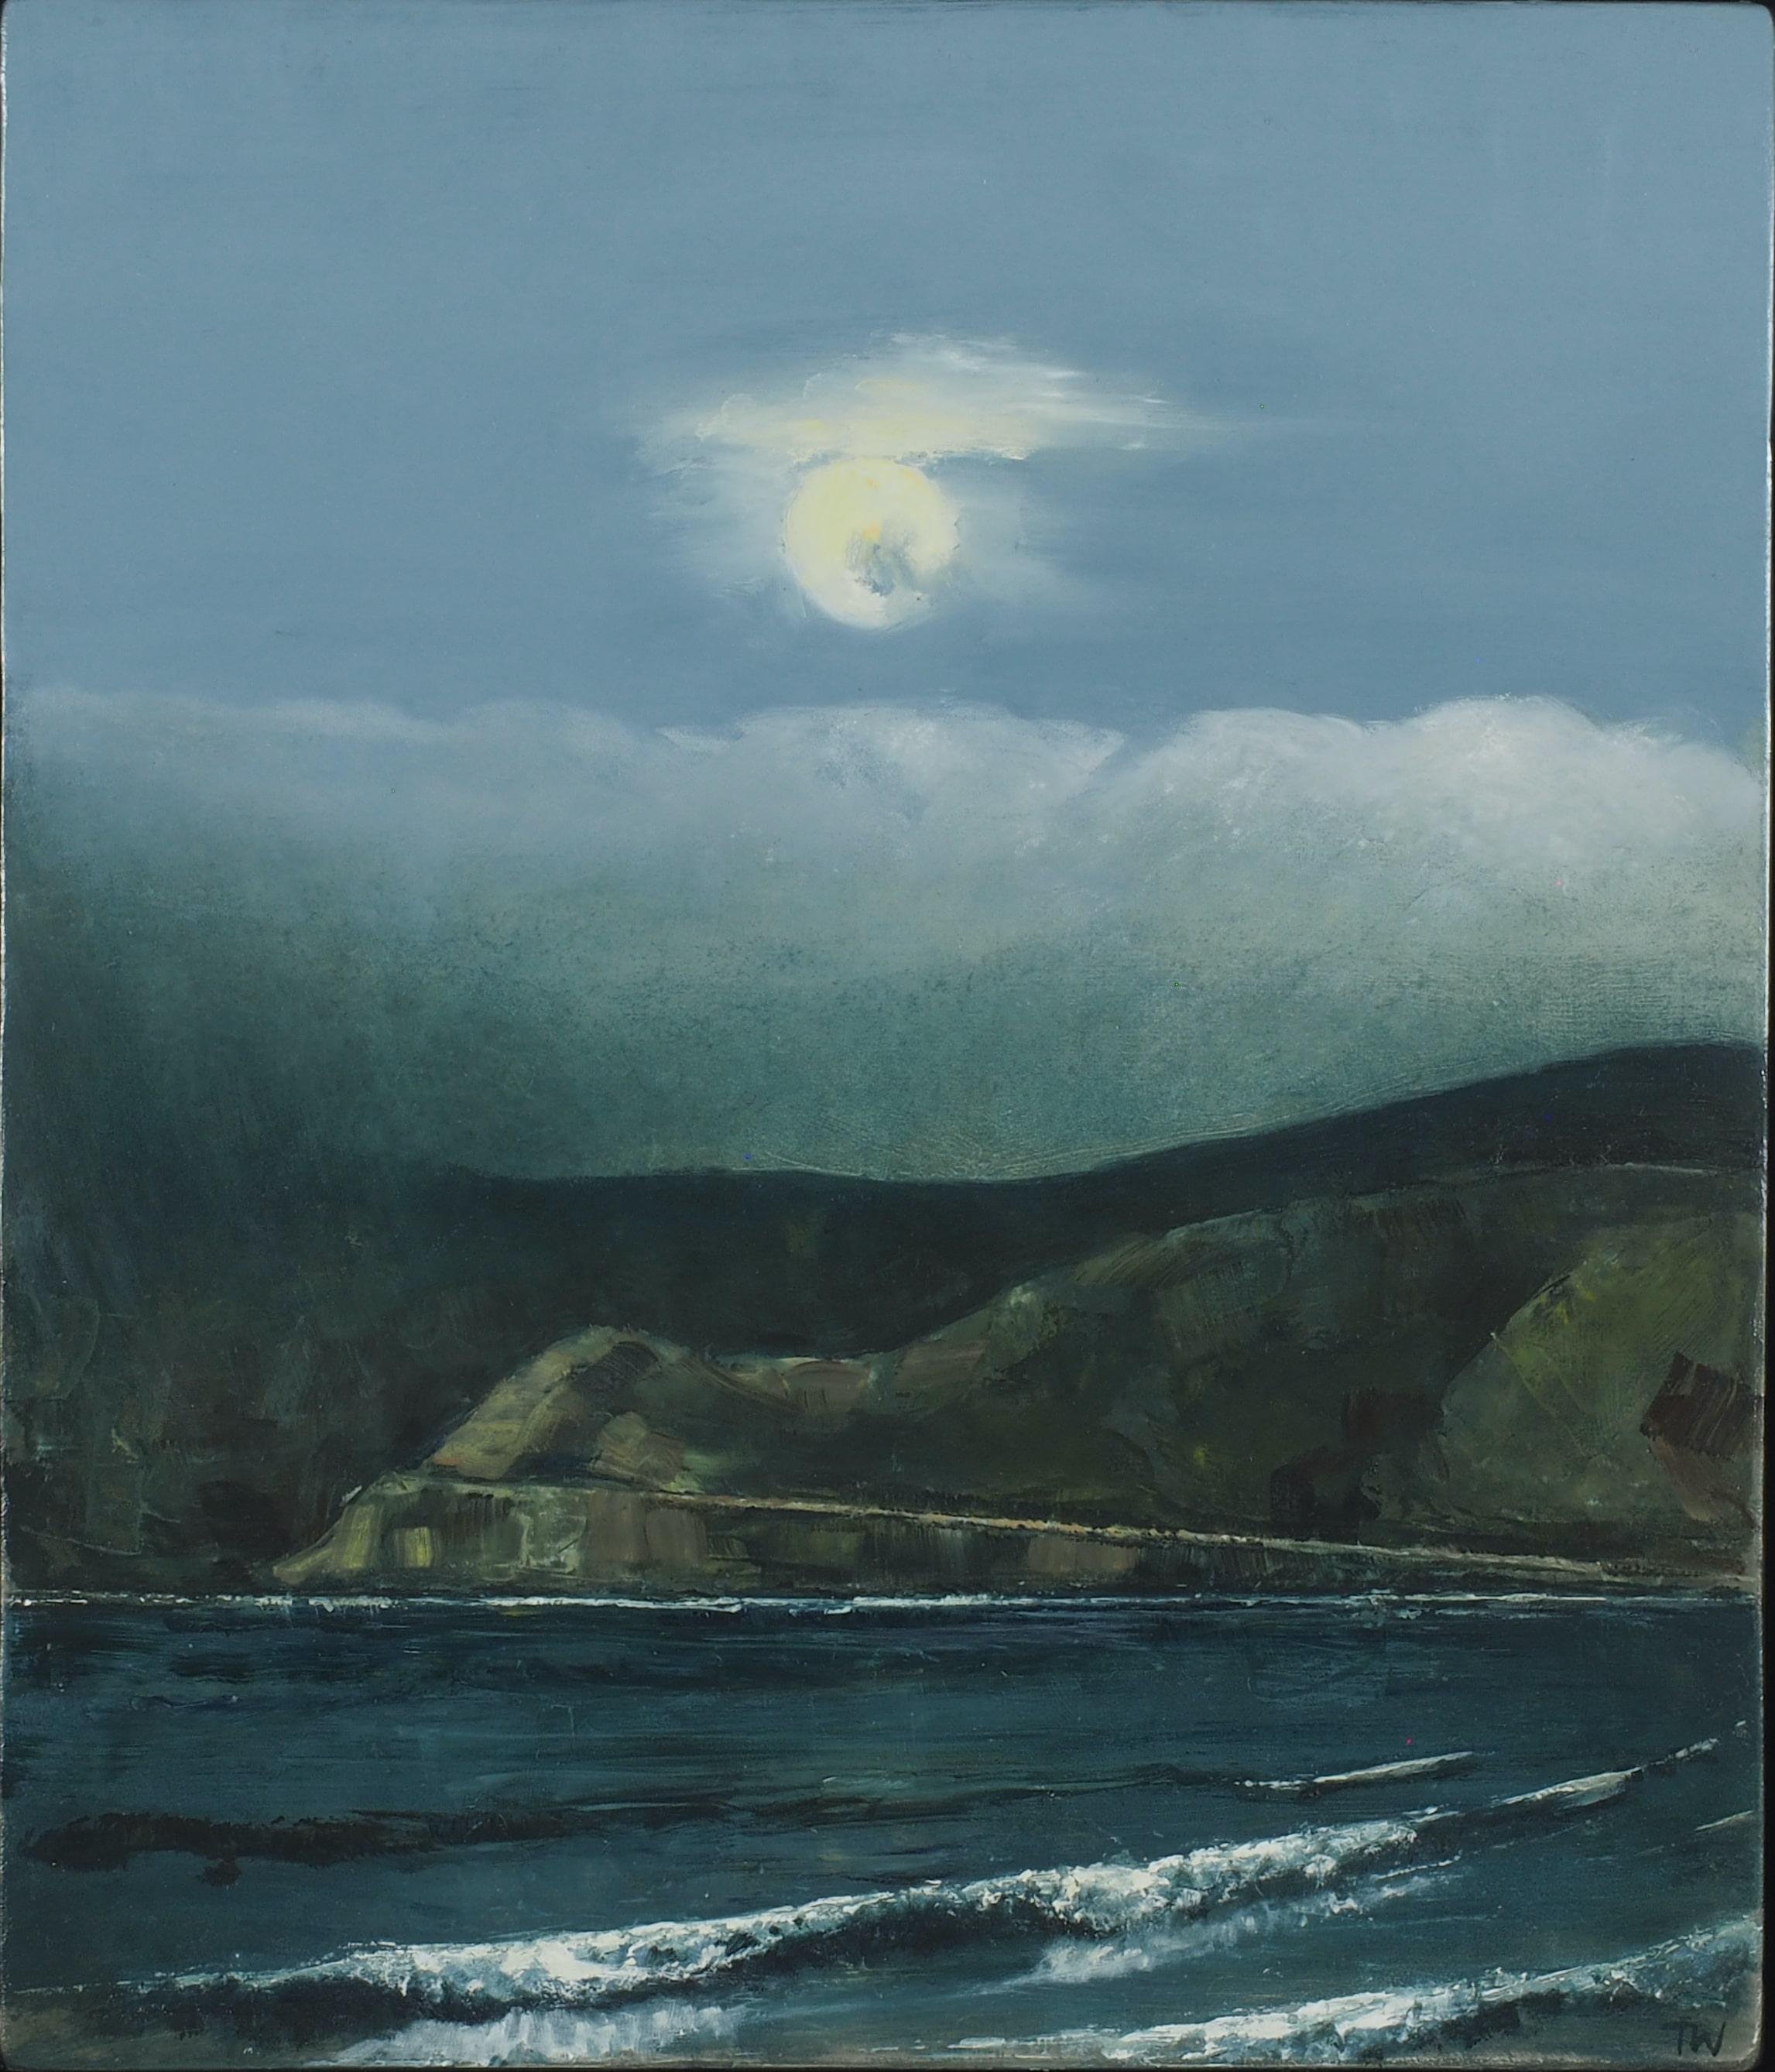 'Full moon over the great ocean road', '20, oil on panel, 47x40cm-min